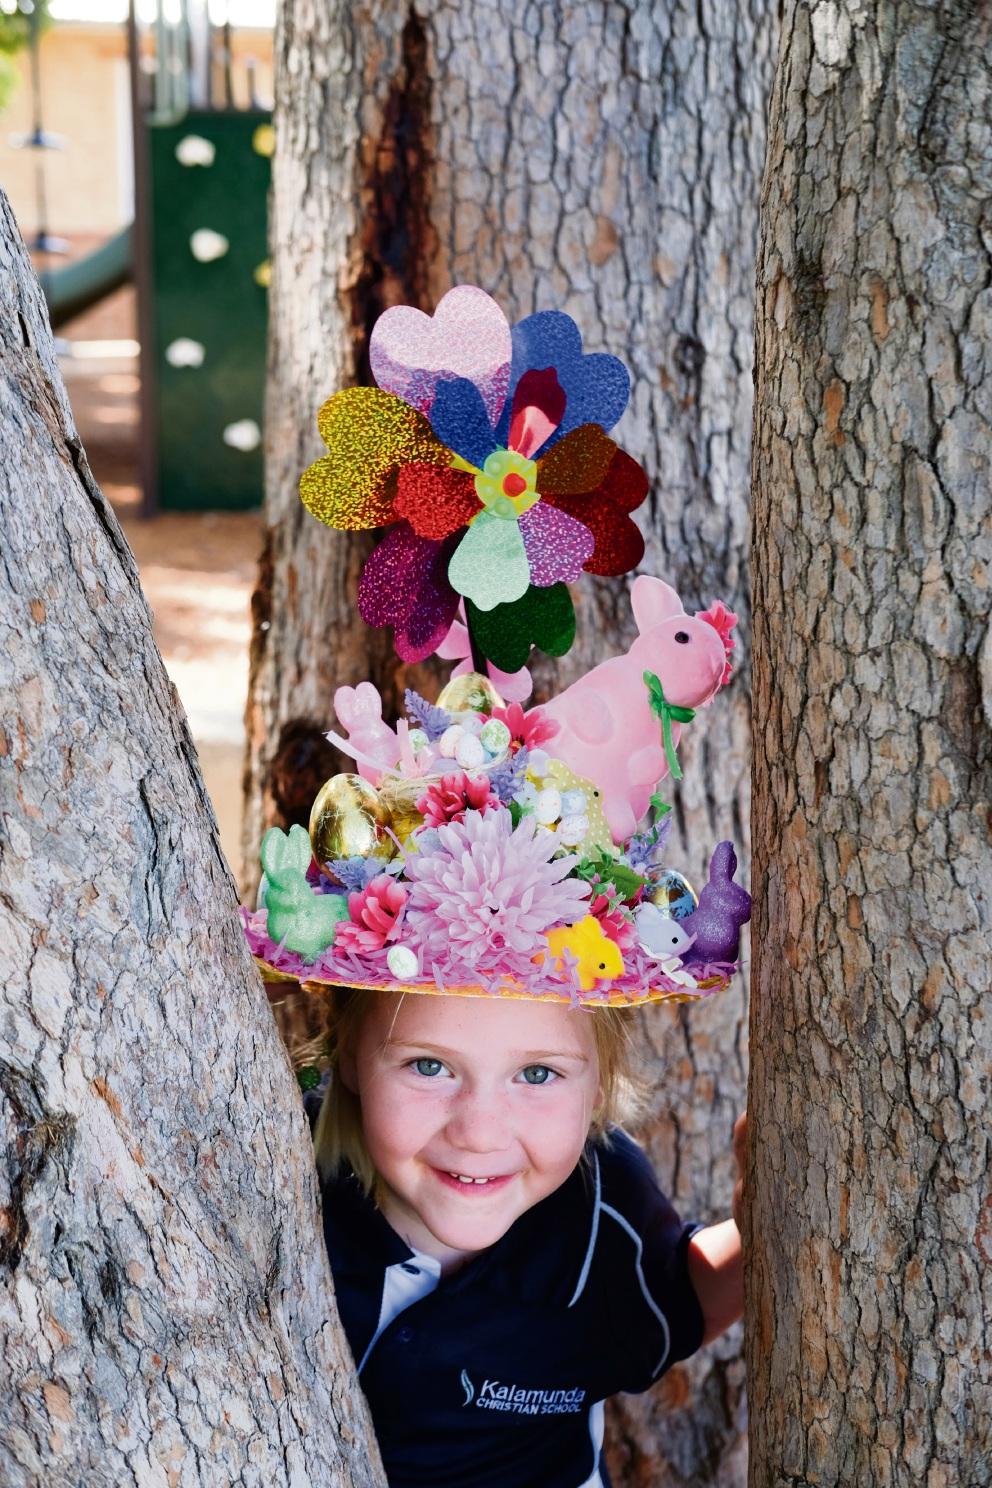 Kalamunda Christian School student Holly Allen's Eggstravagant creation.        467430p